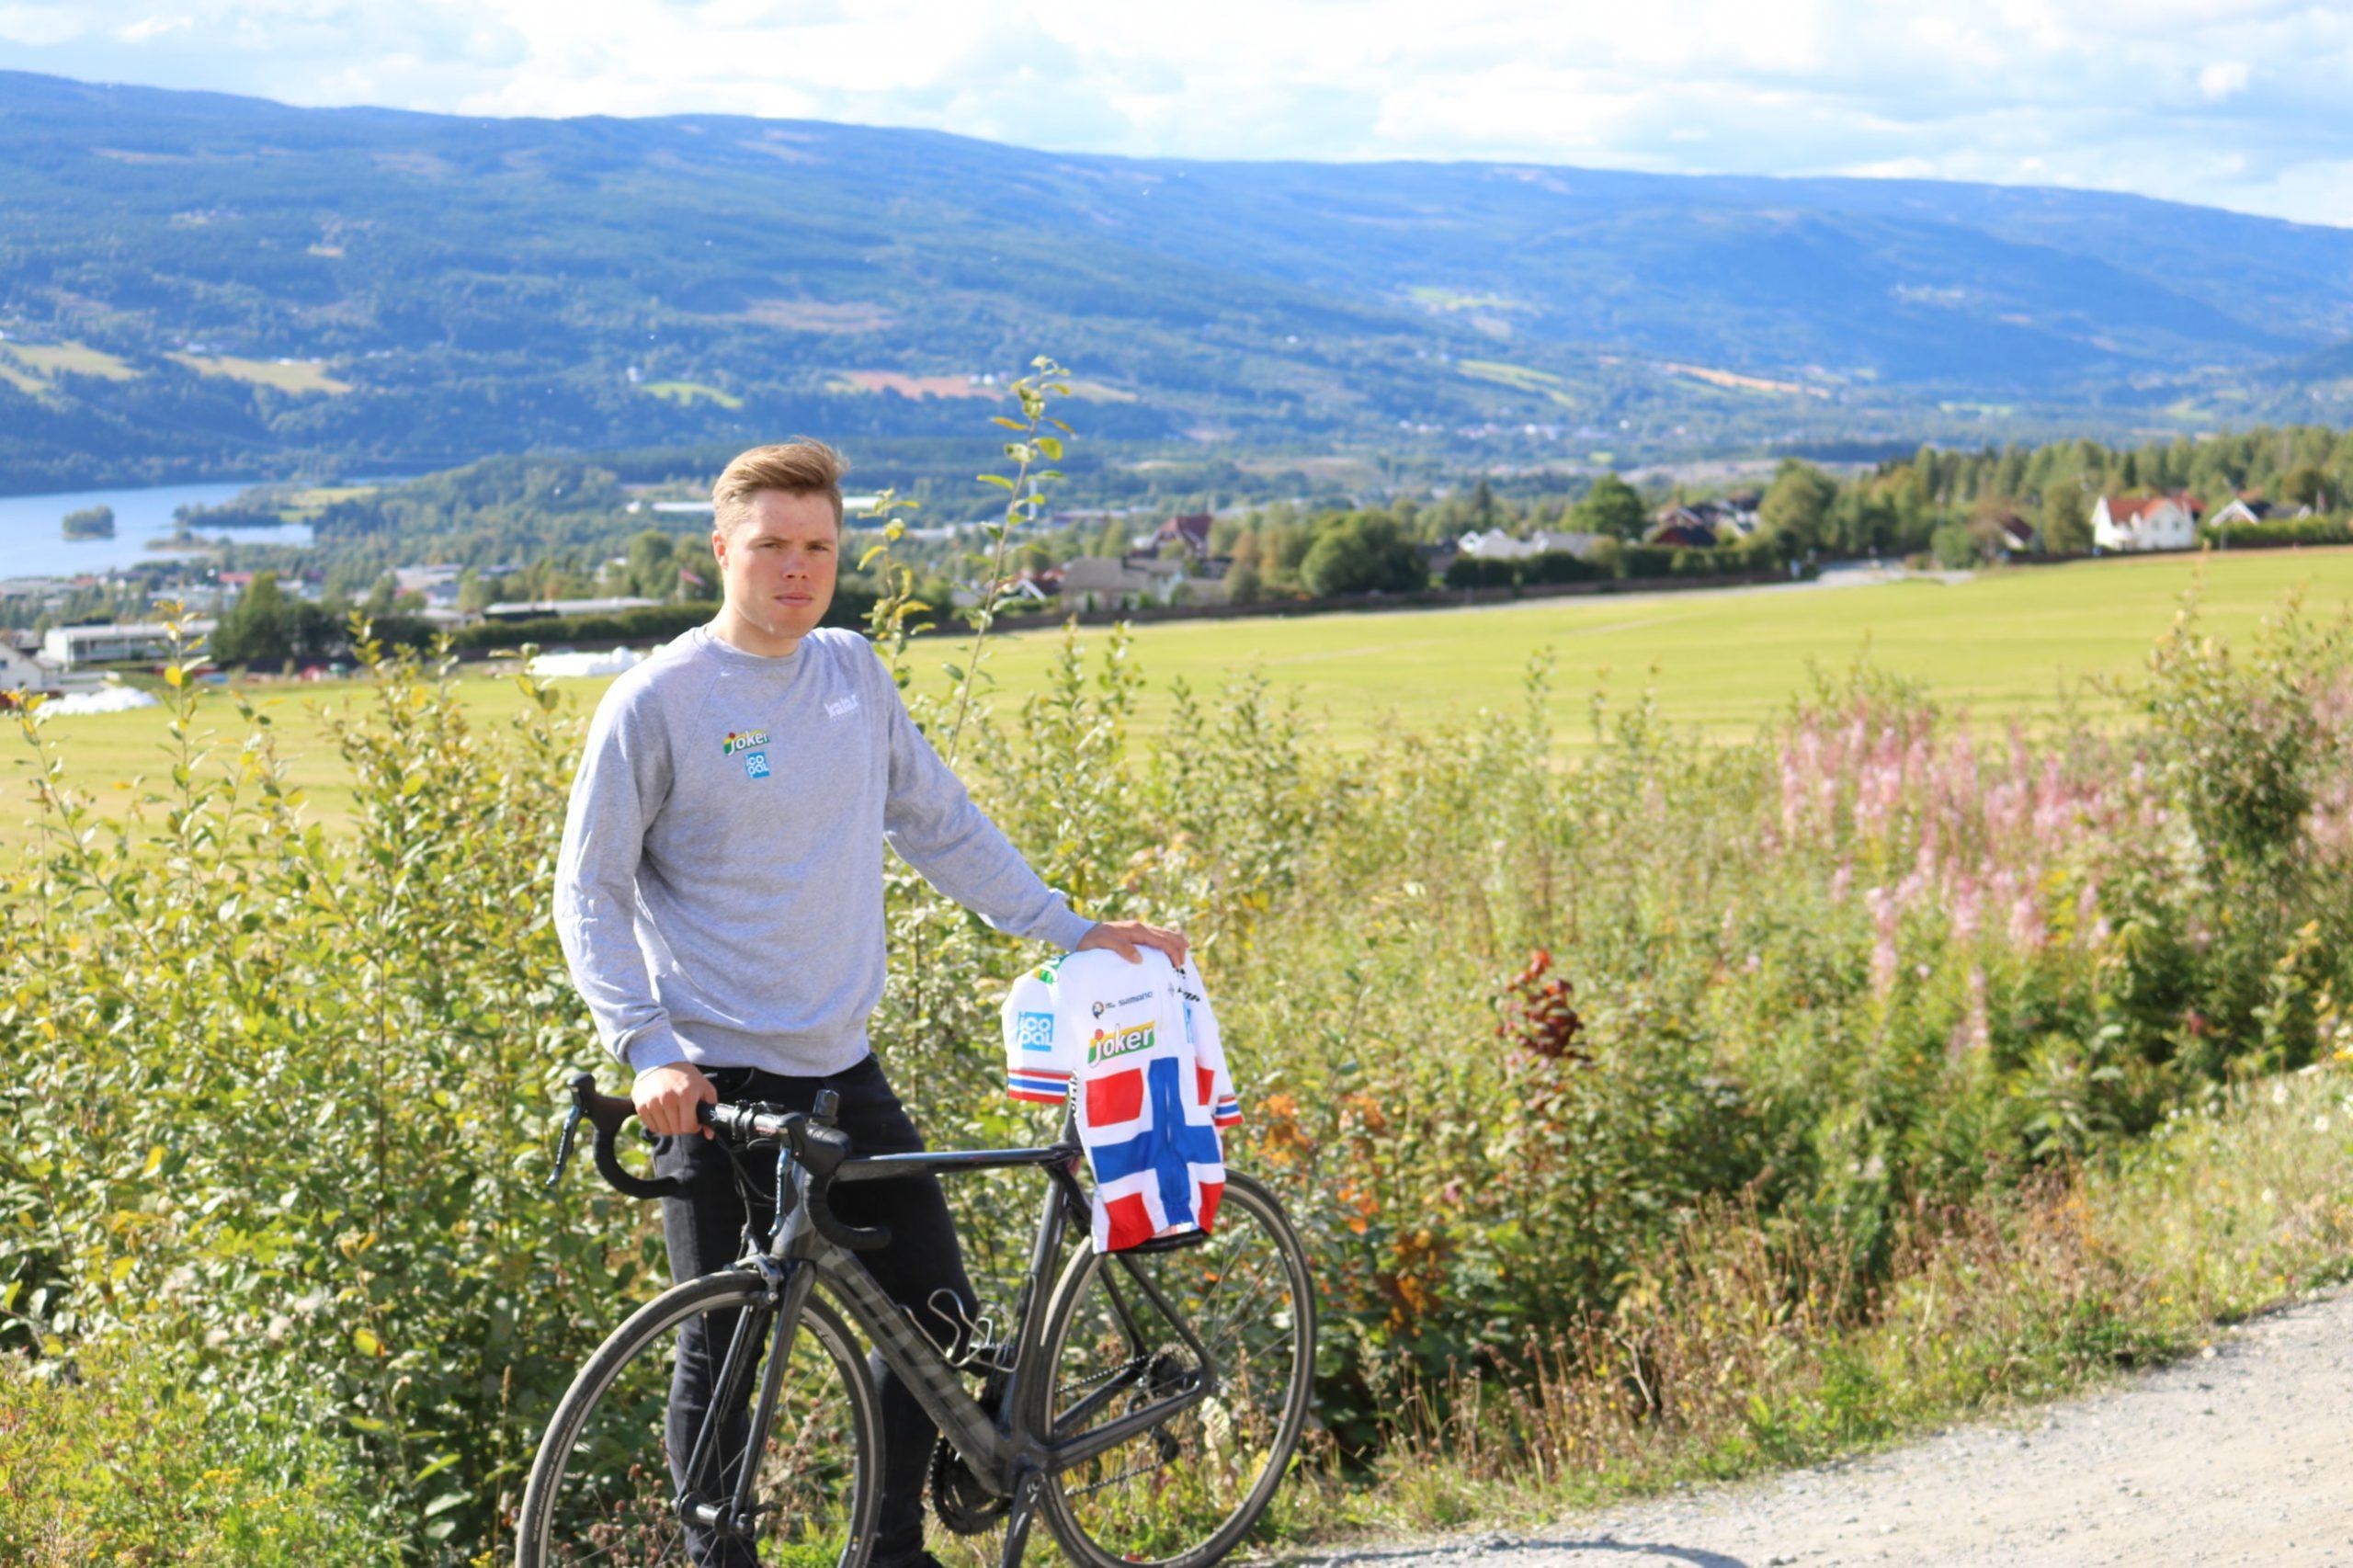 Norgesmester – mot alle odds